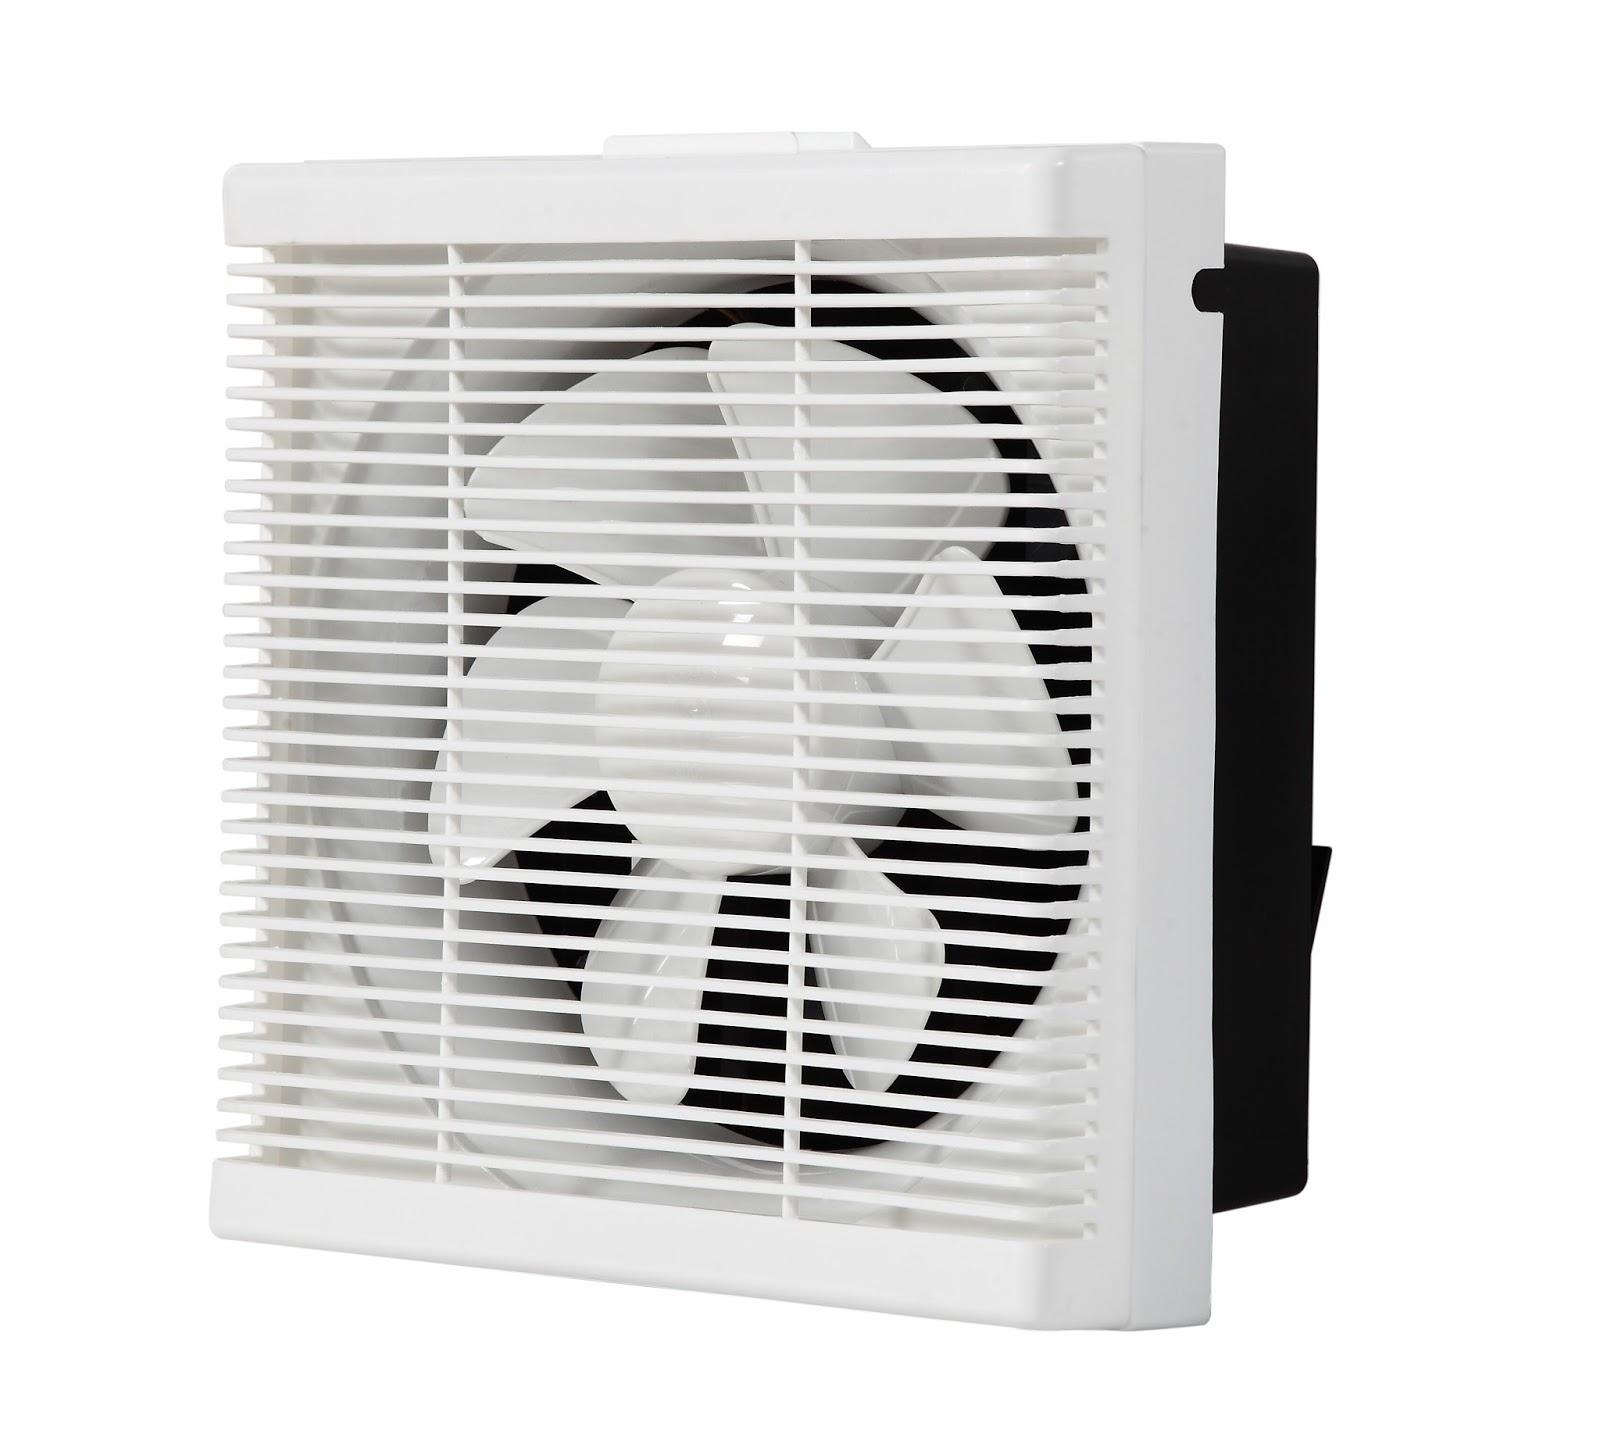 Commercial Ventilation Fans : Industrial exhaust fan